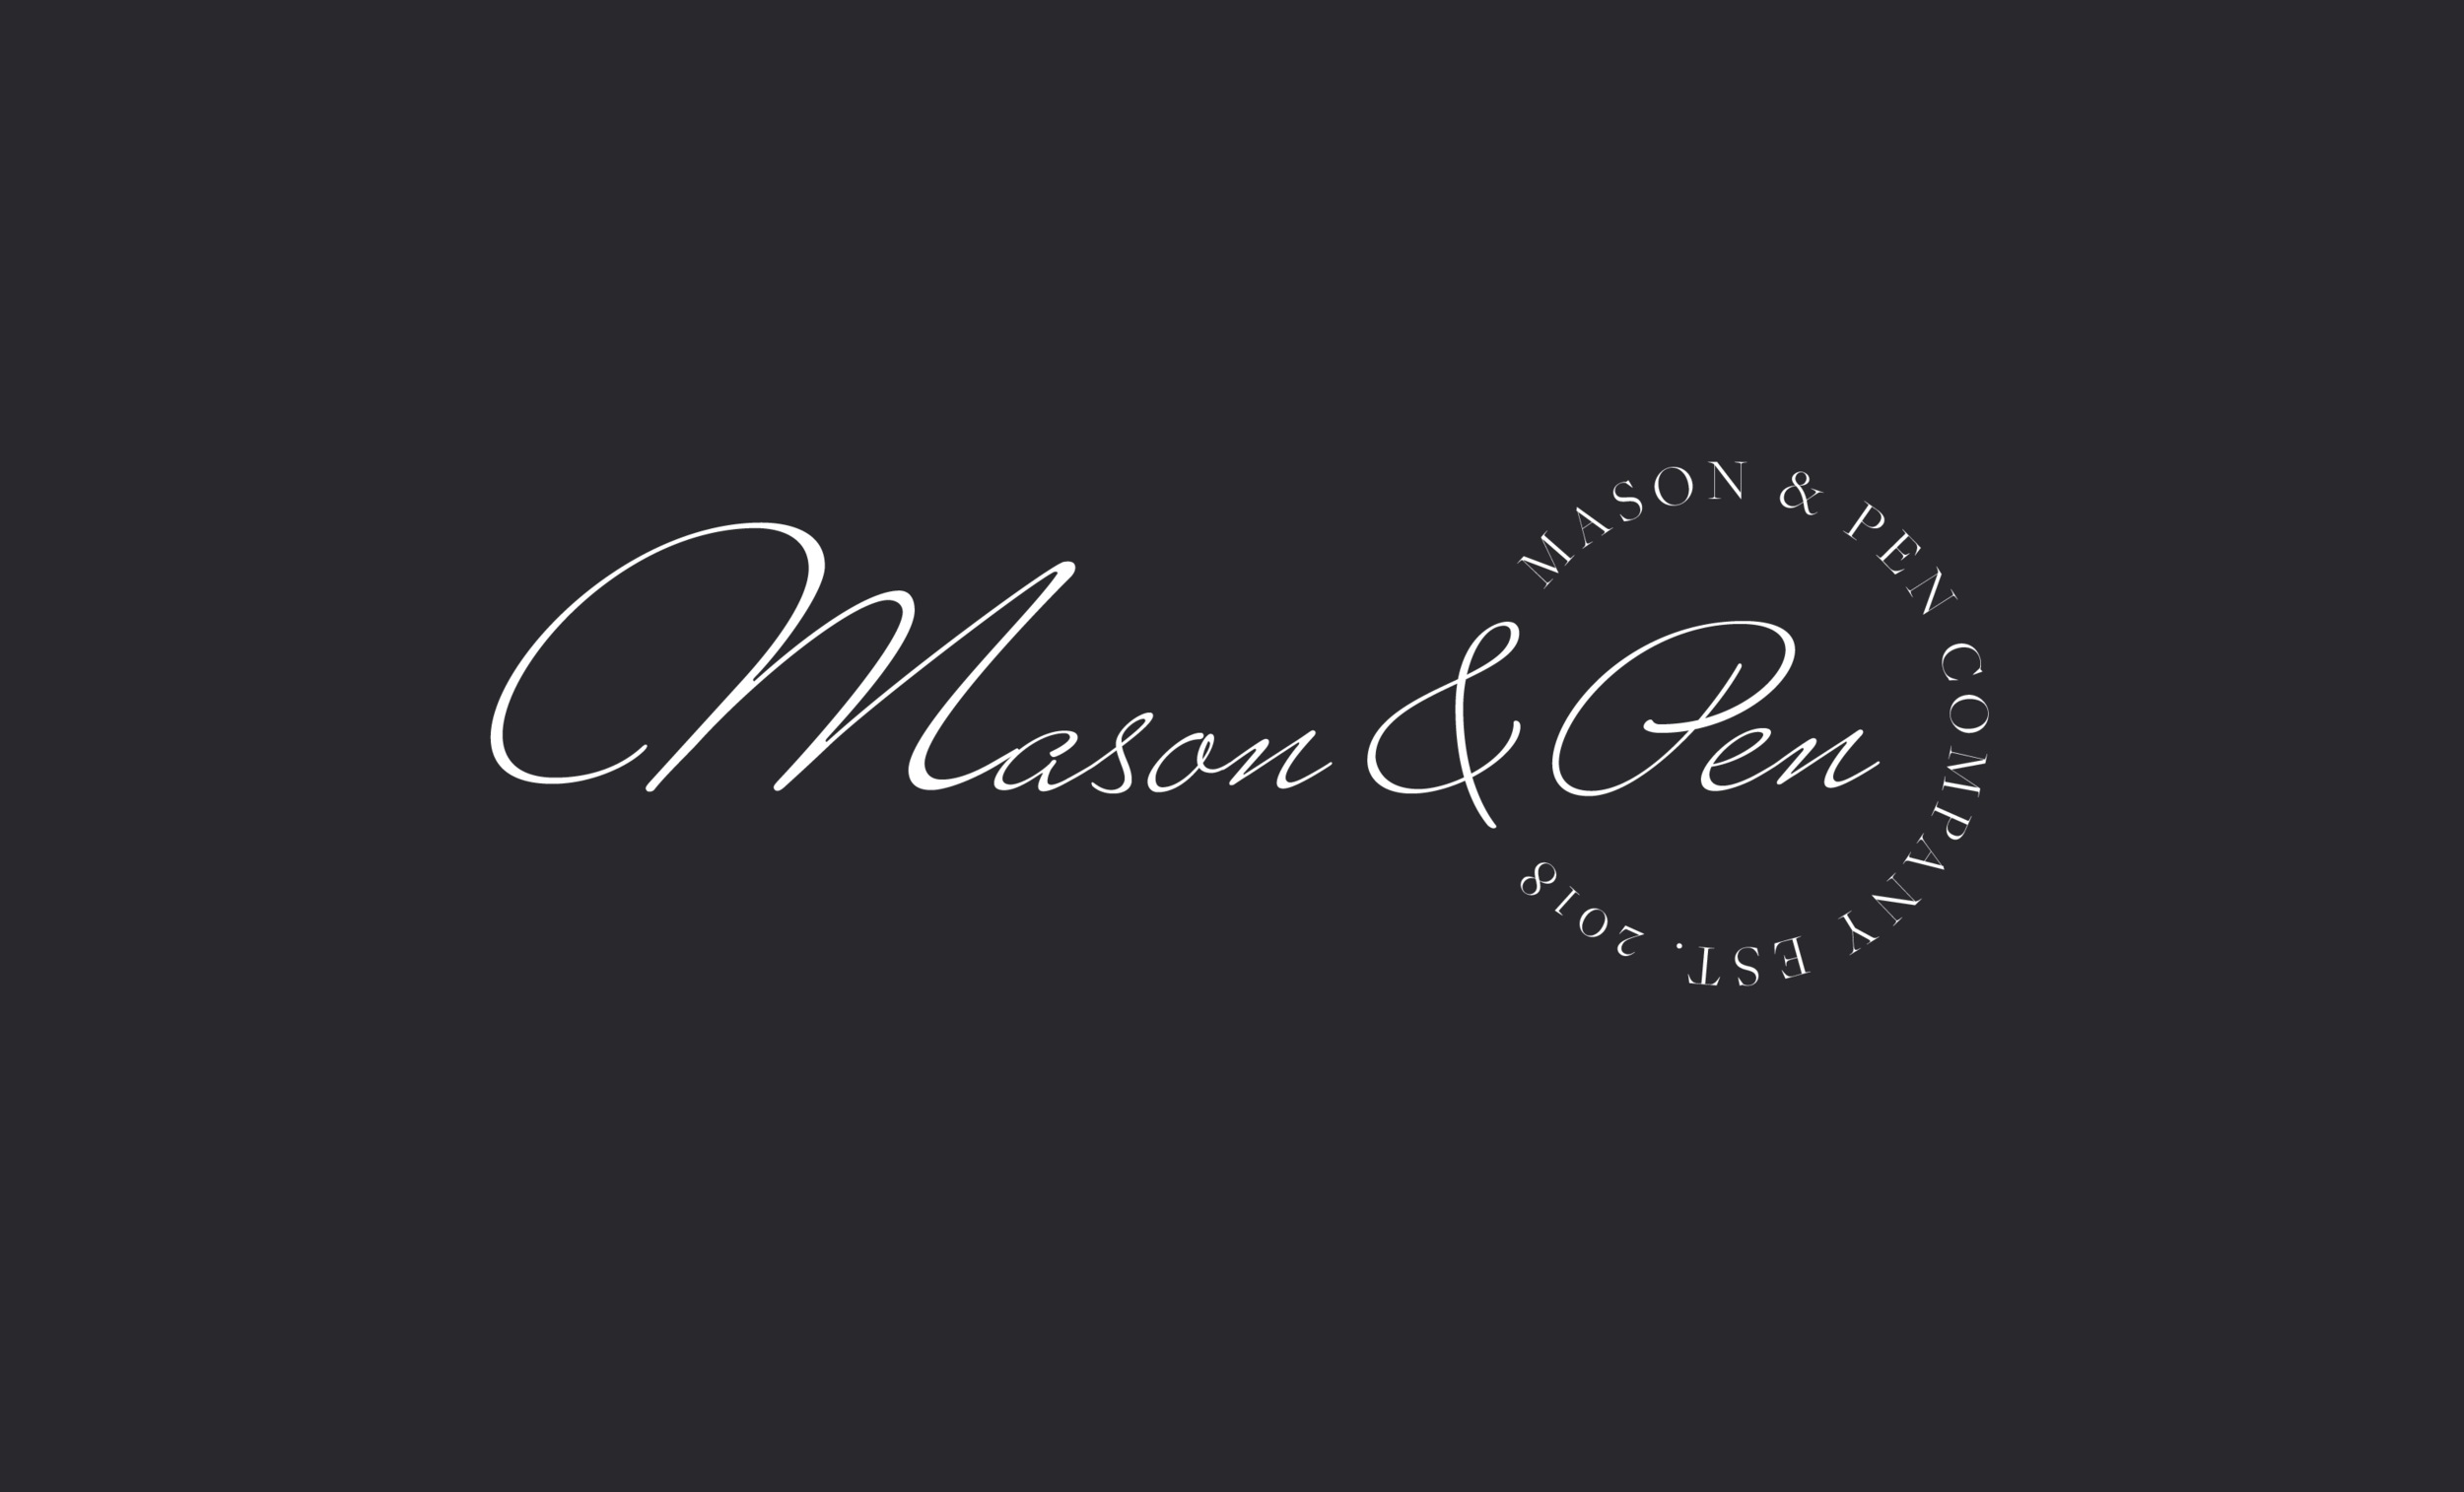 Mason+and+Pen+logo+02%404x.jpg